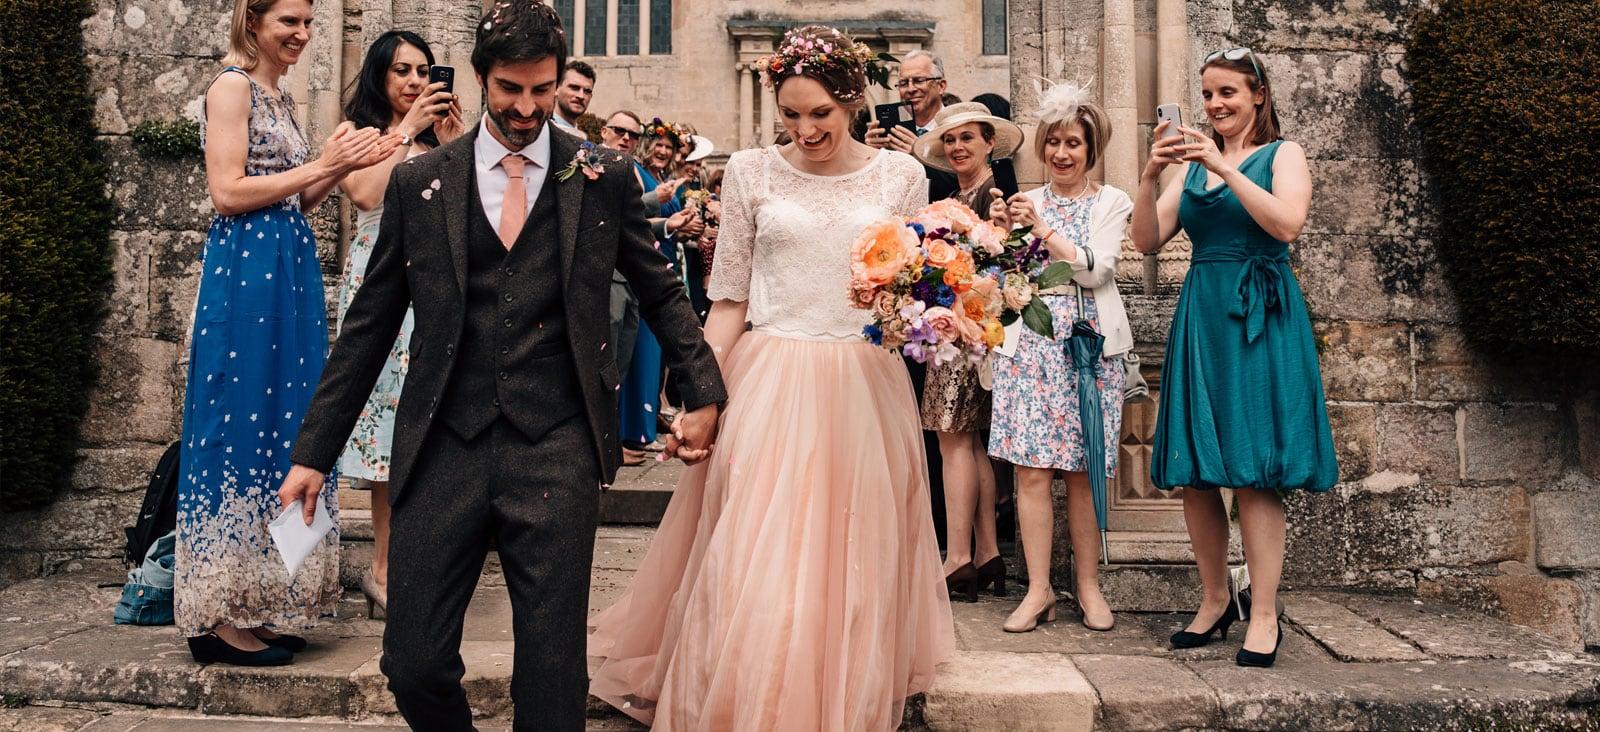 Festival Style Wedding – Harrogate